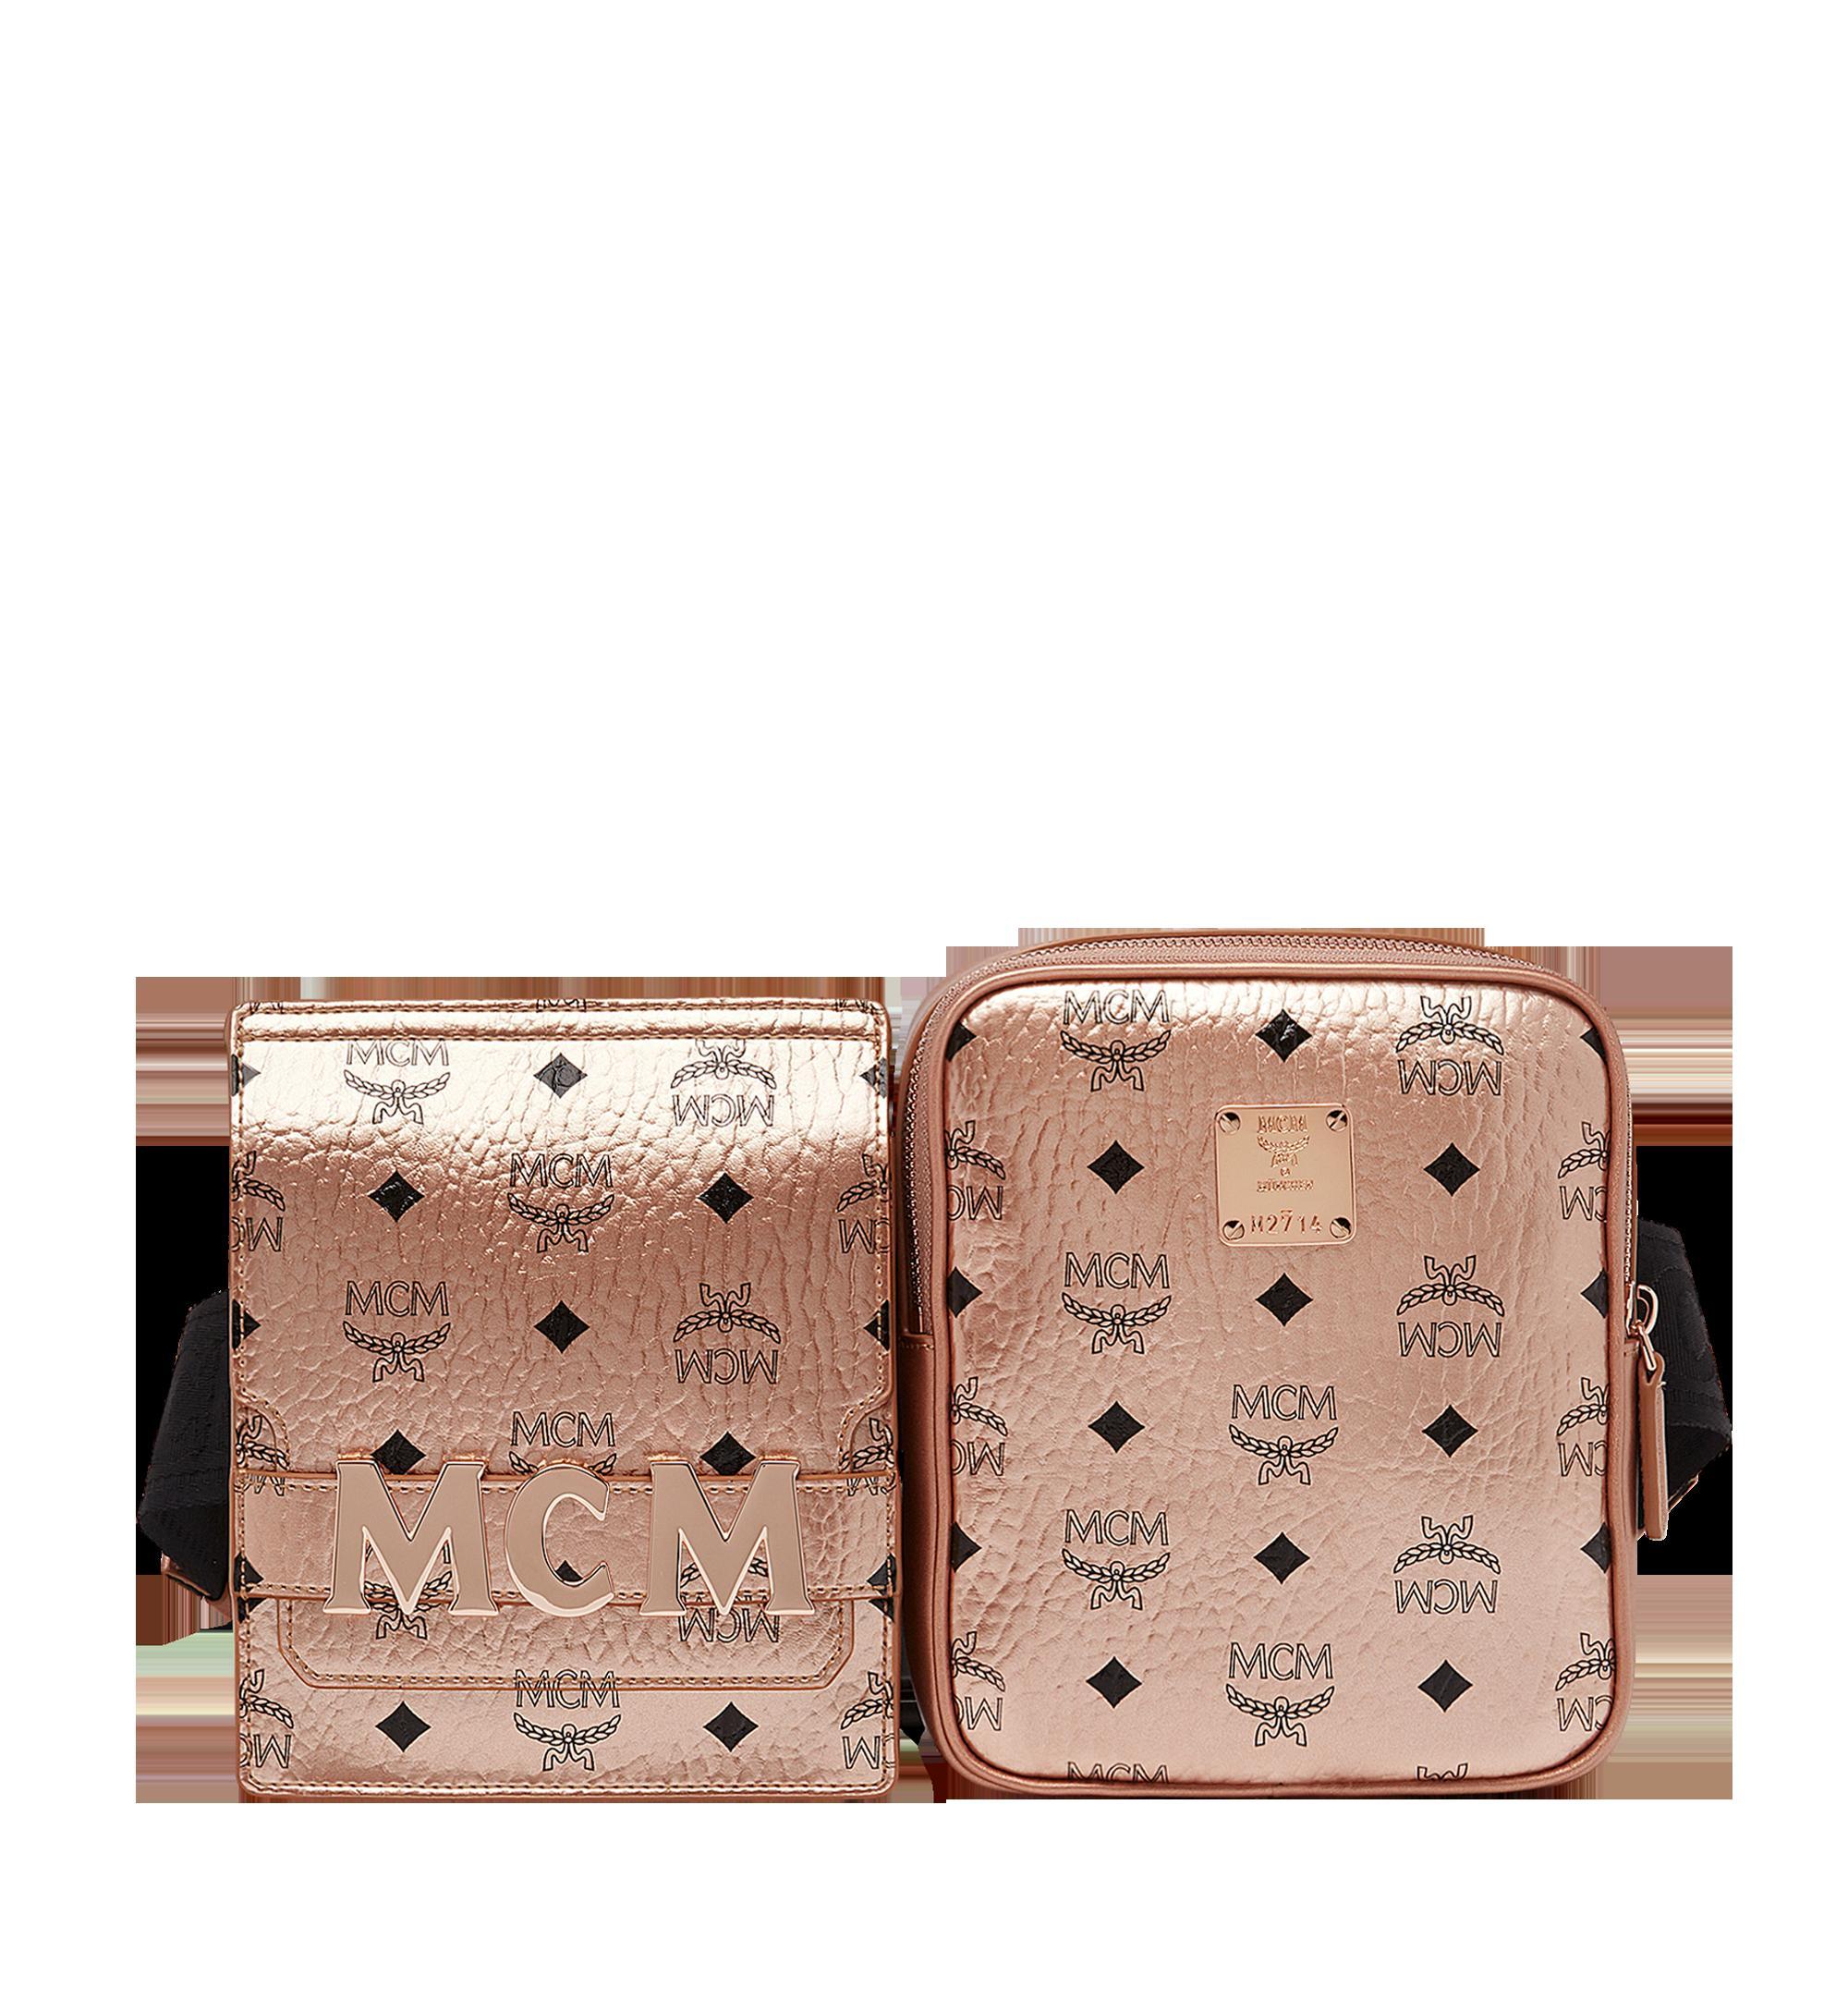 d84a9bc9cdde Mcm Stark Canvas Double Belt Bag - Metallic In Tc